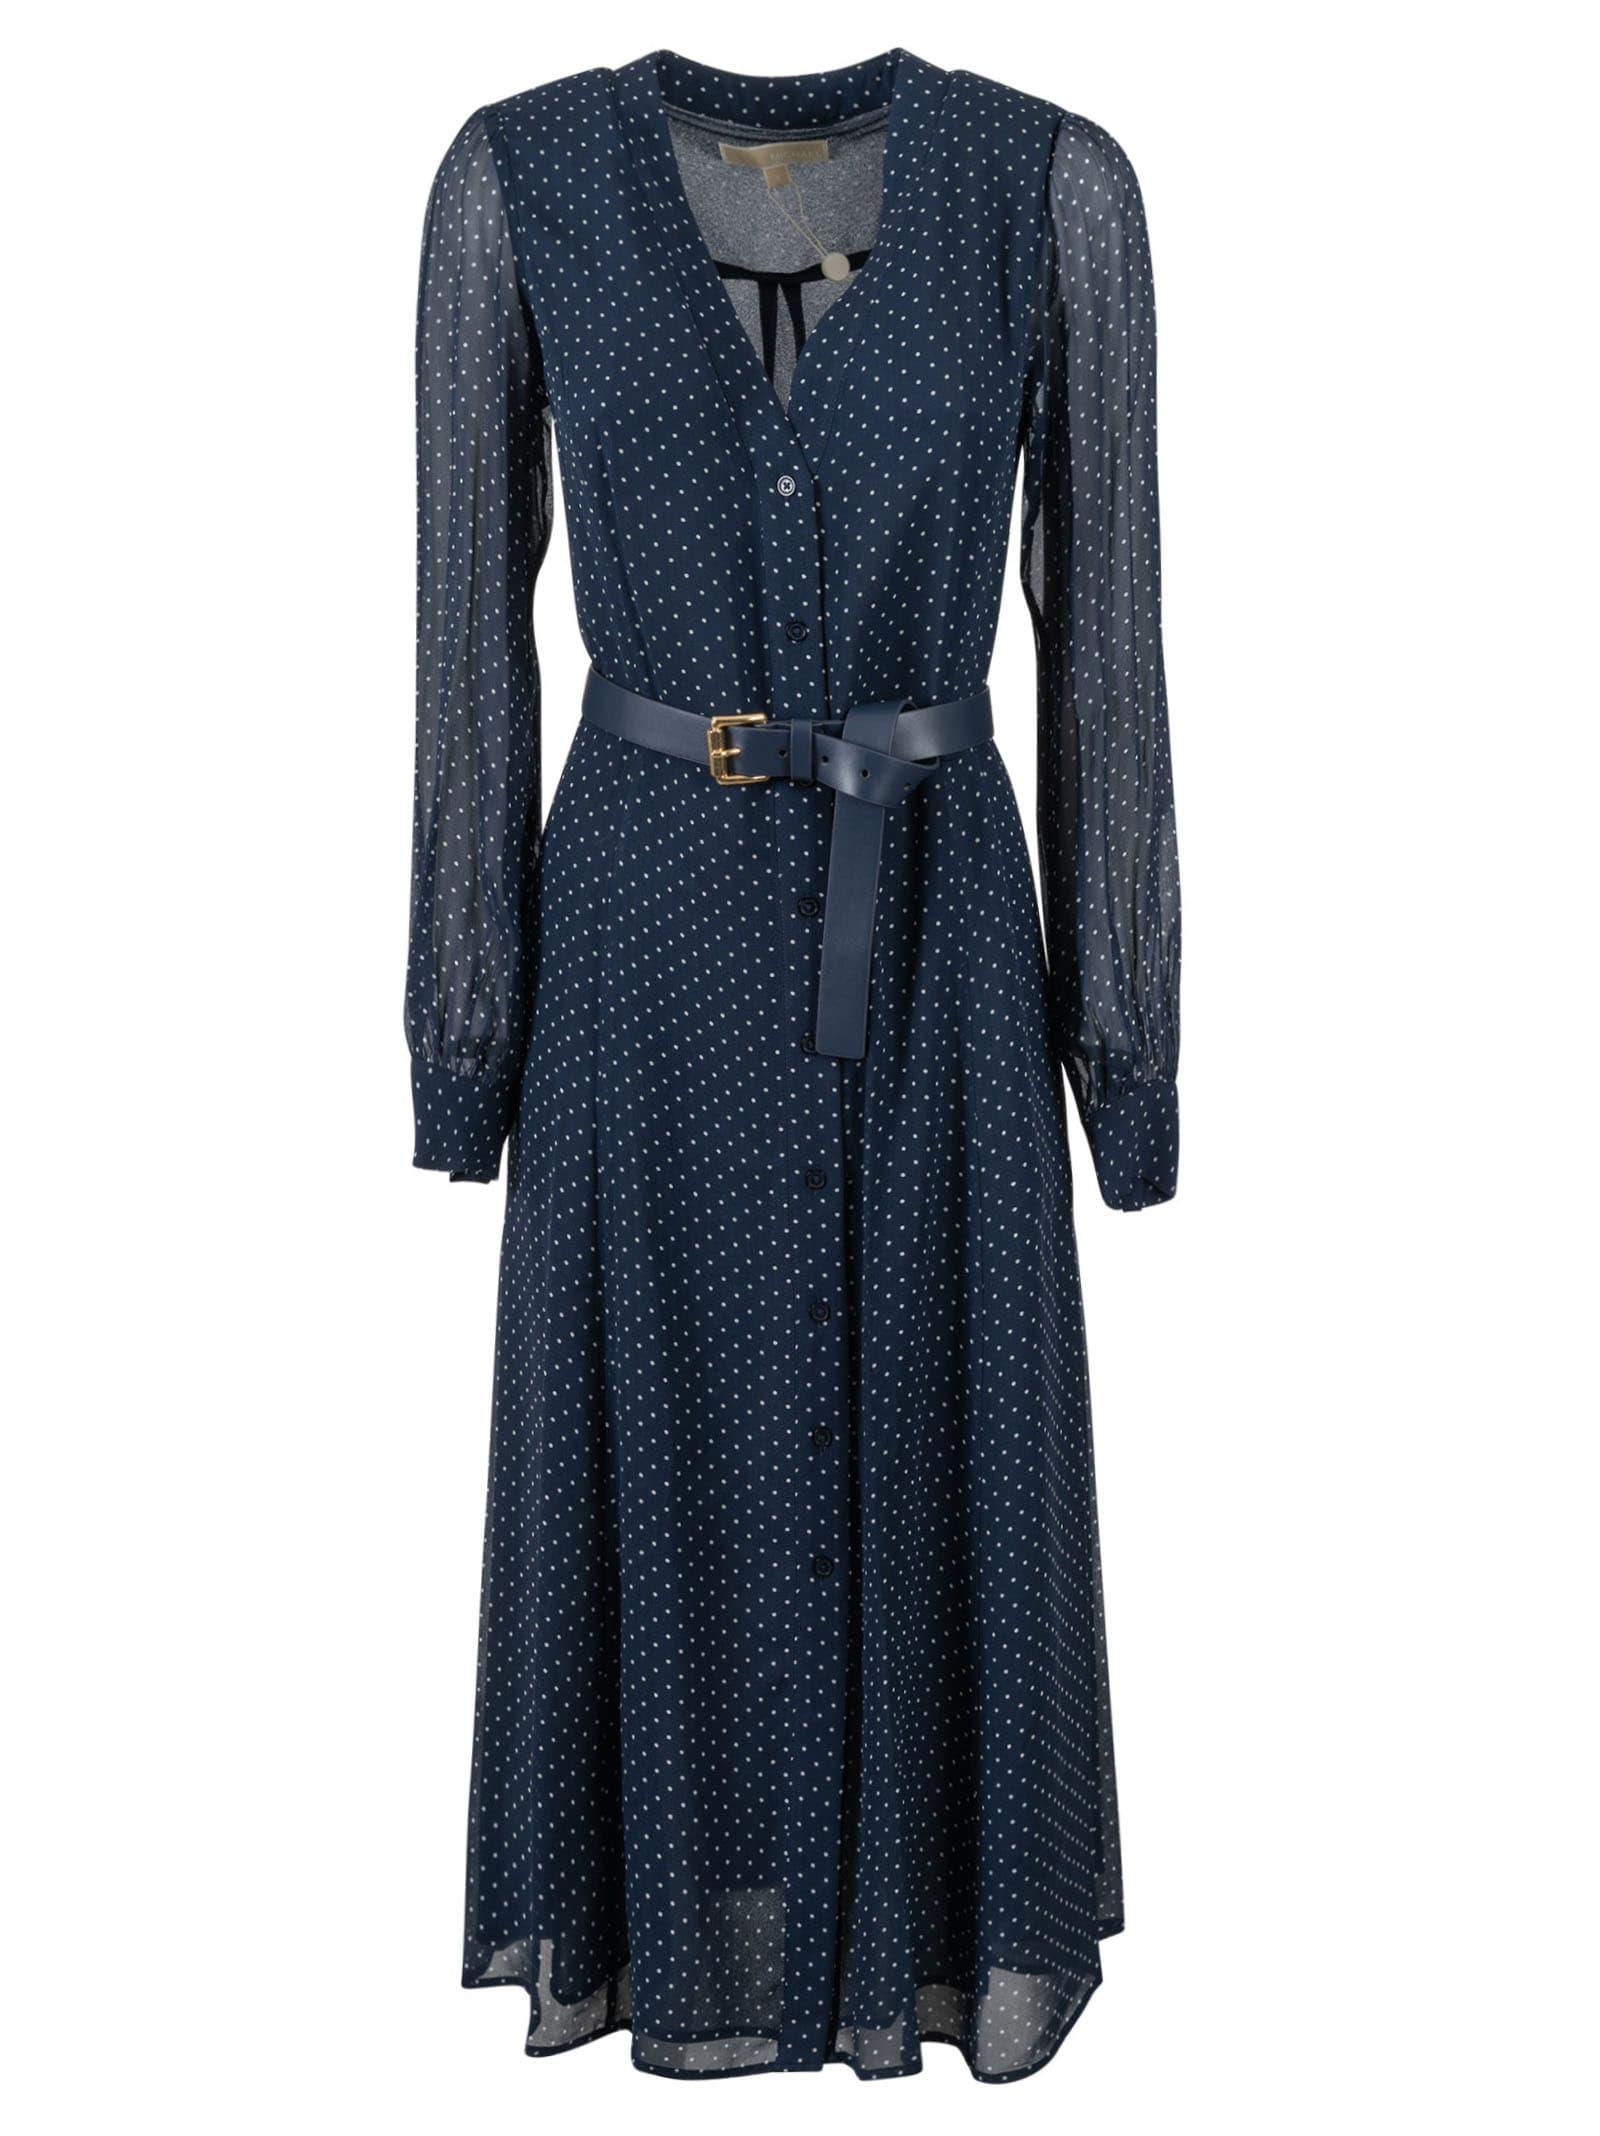 Michael Michael Kors Clothing POLKA DOT LACE SLEEVED DRESS